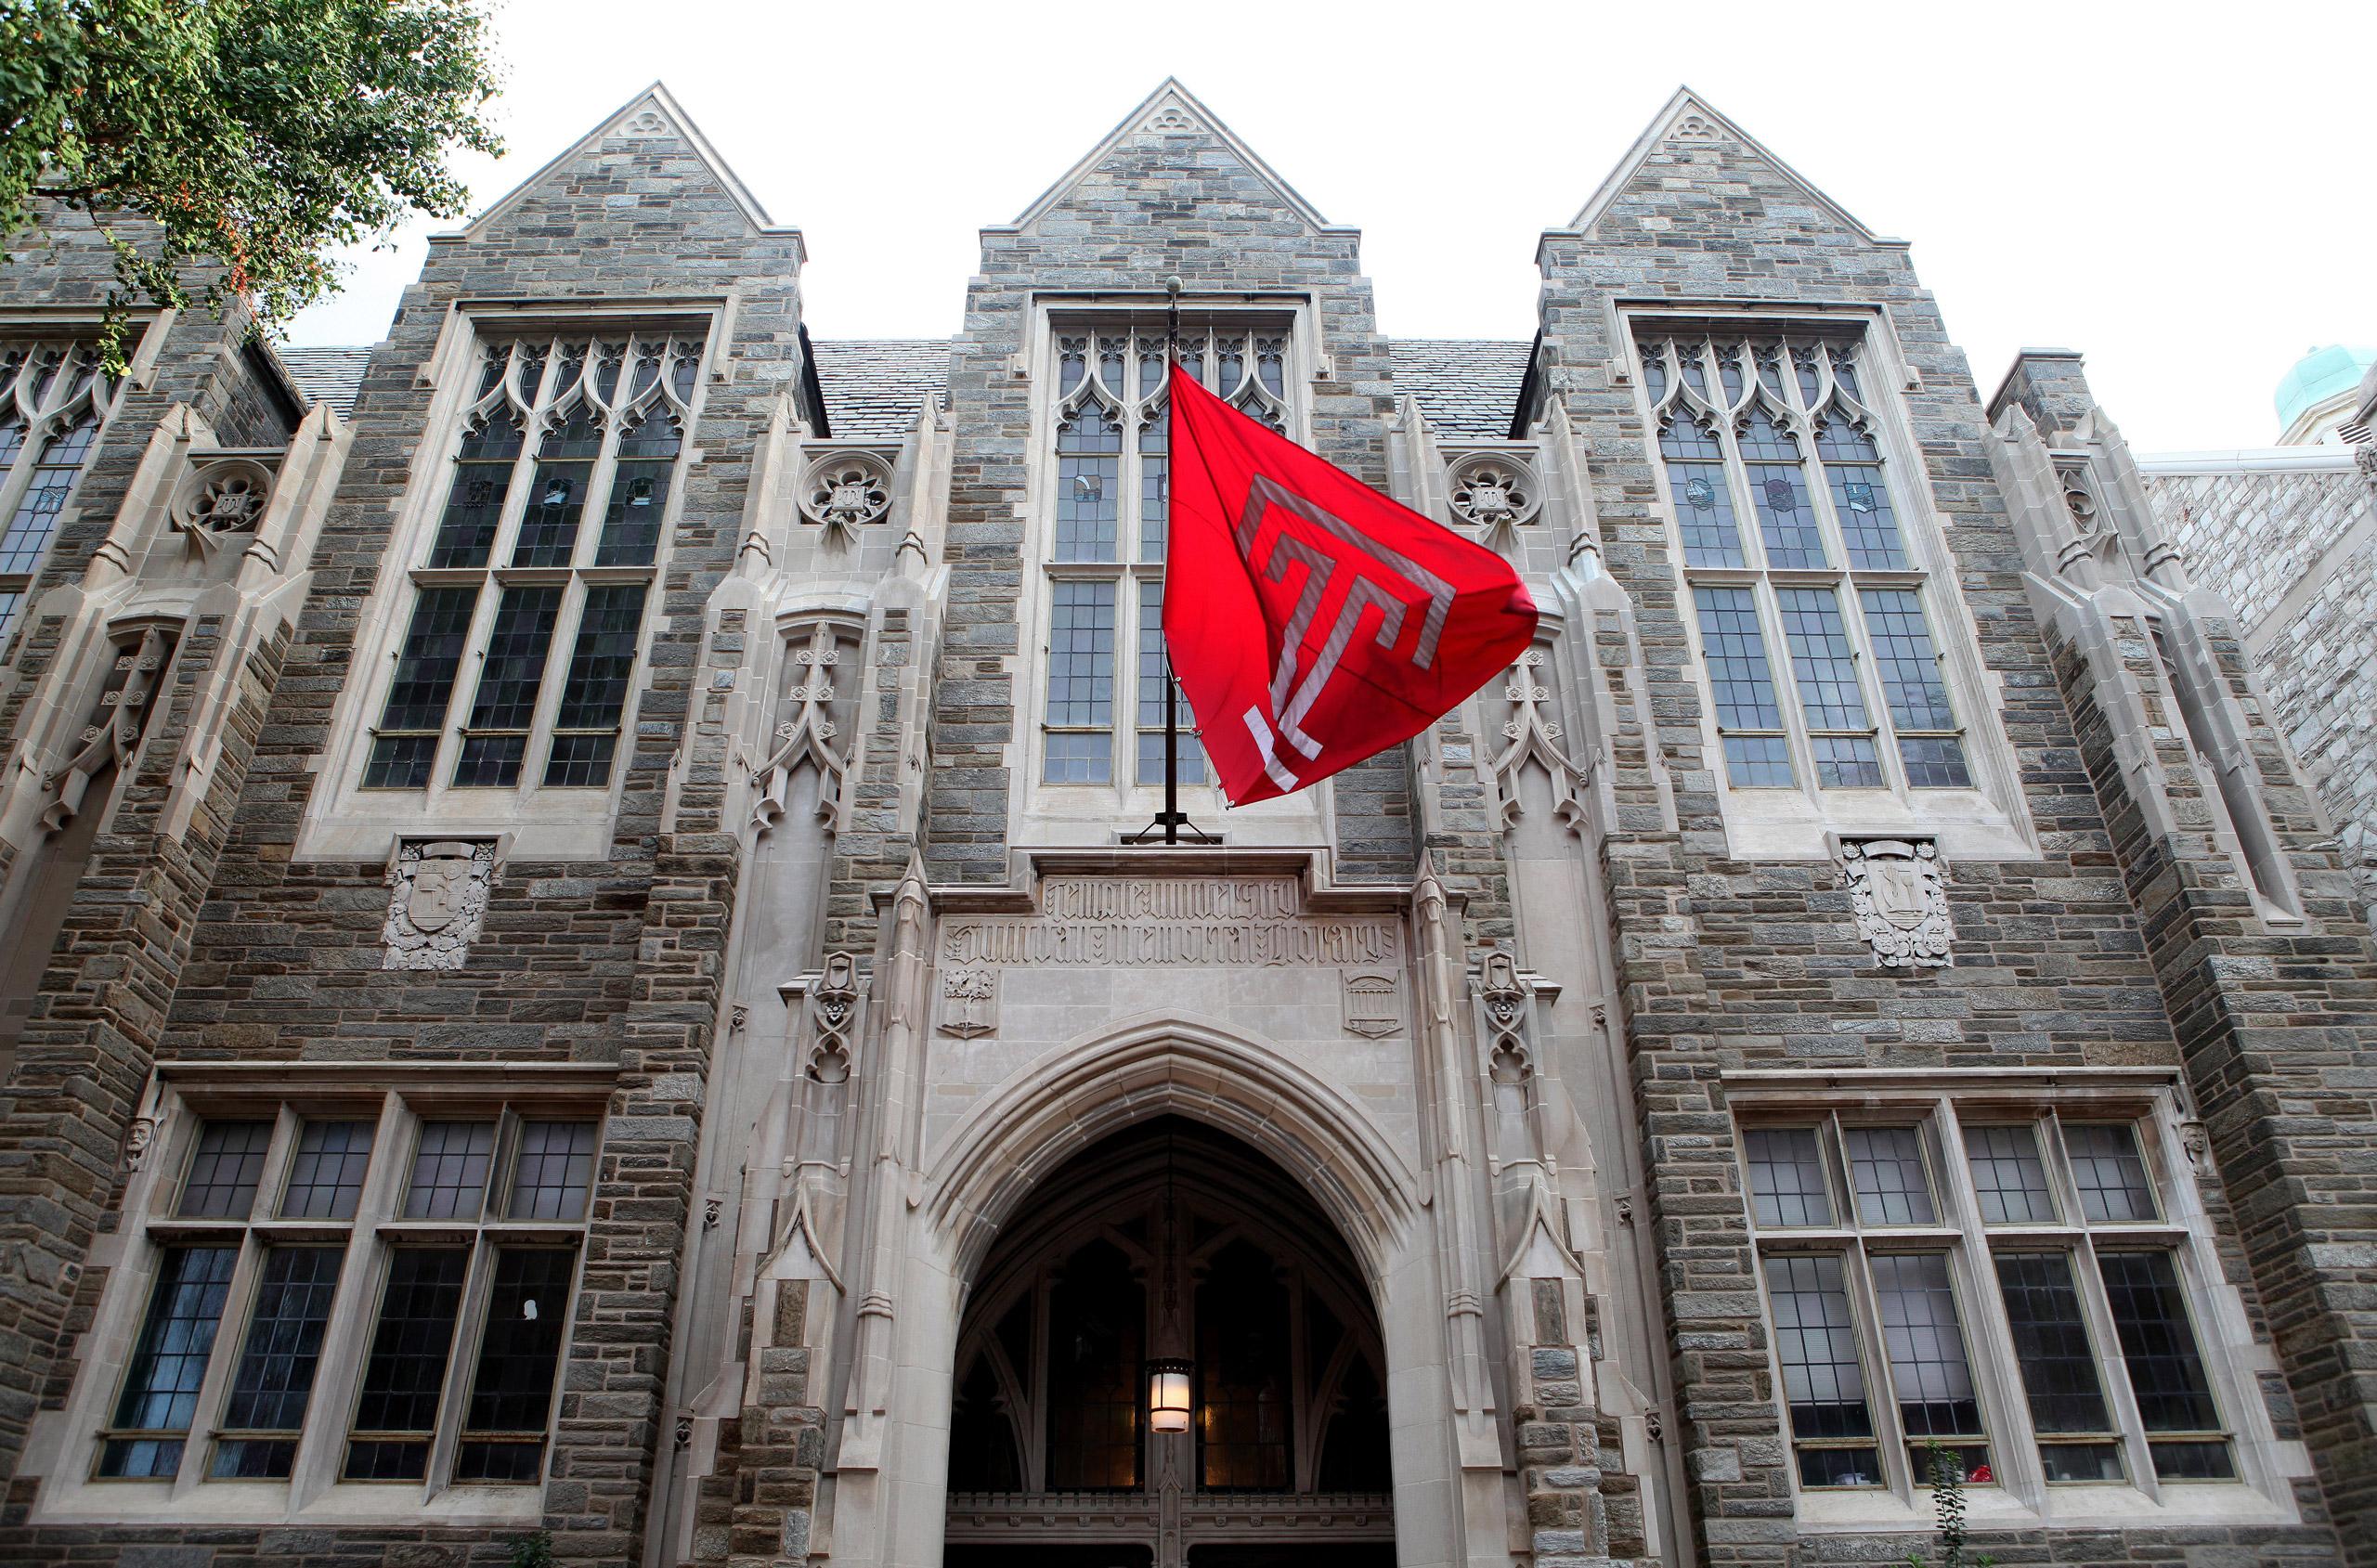 Sullivan Memorial Library at Temple University in Philadelphia on Aug. 27, 2016.